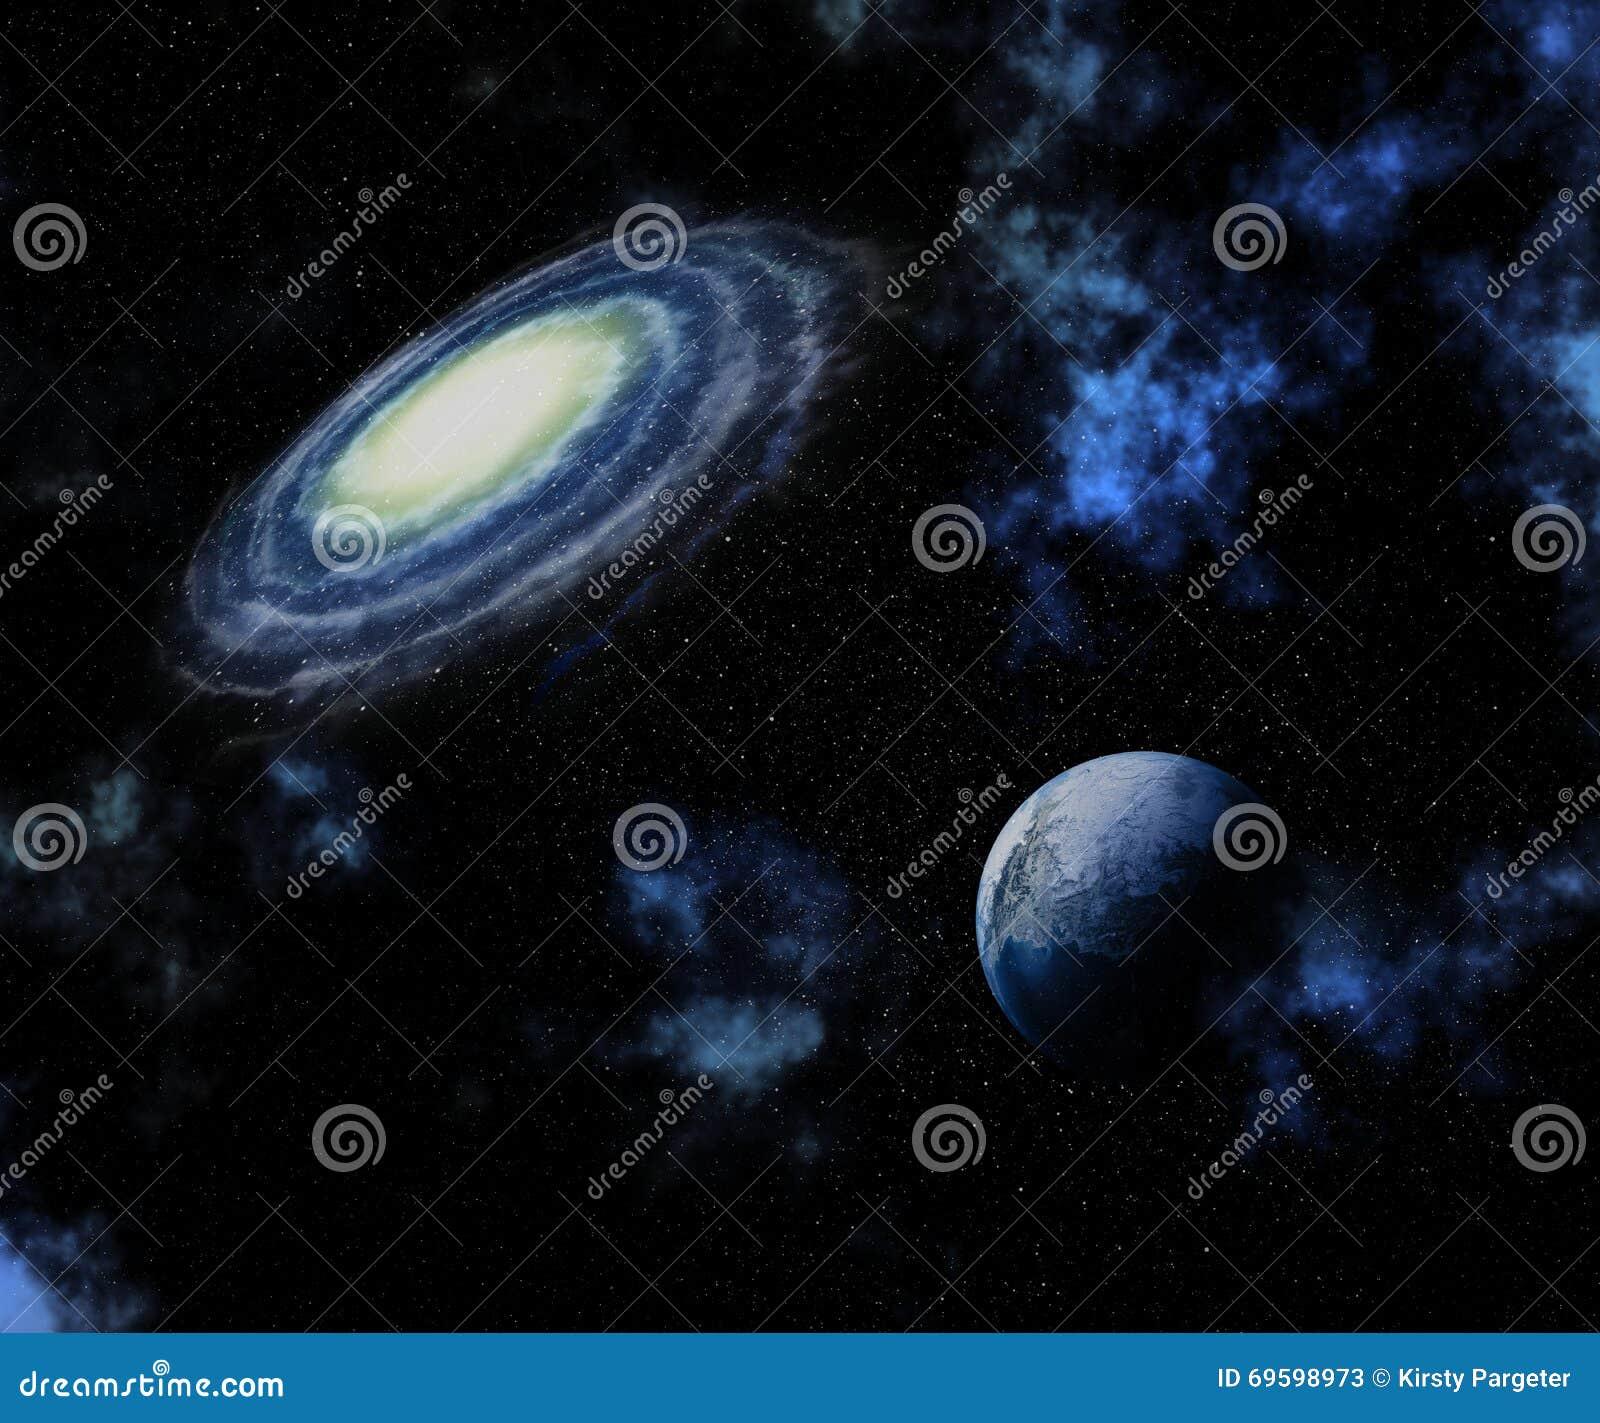 nebula render - photo #48